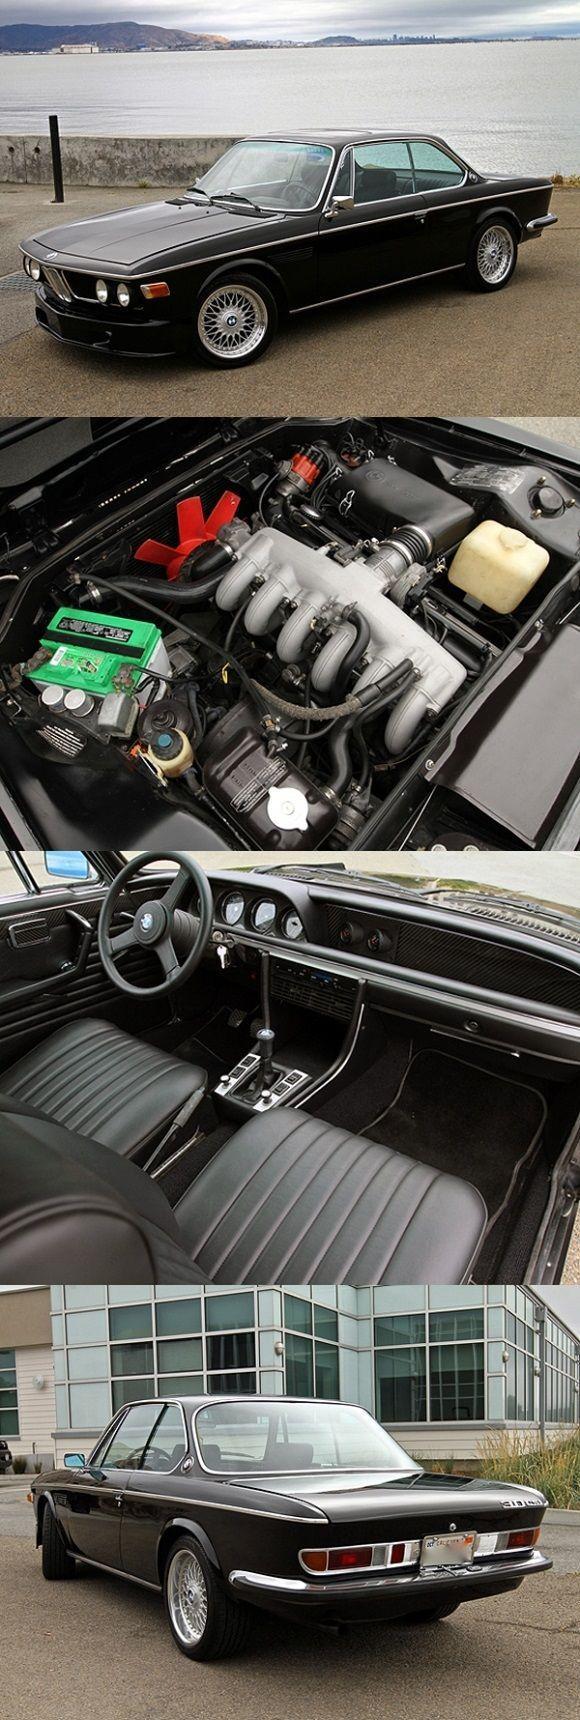 Best 25+ Bmw classic ideas on Pinterest   Bmw classic cars, Bmw e9 ...